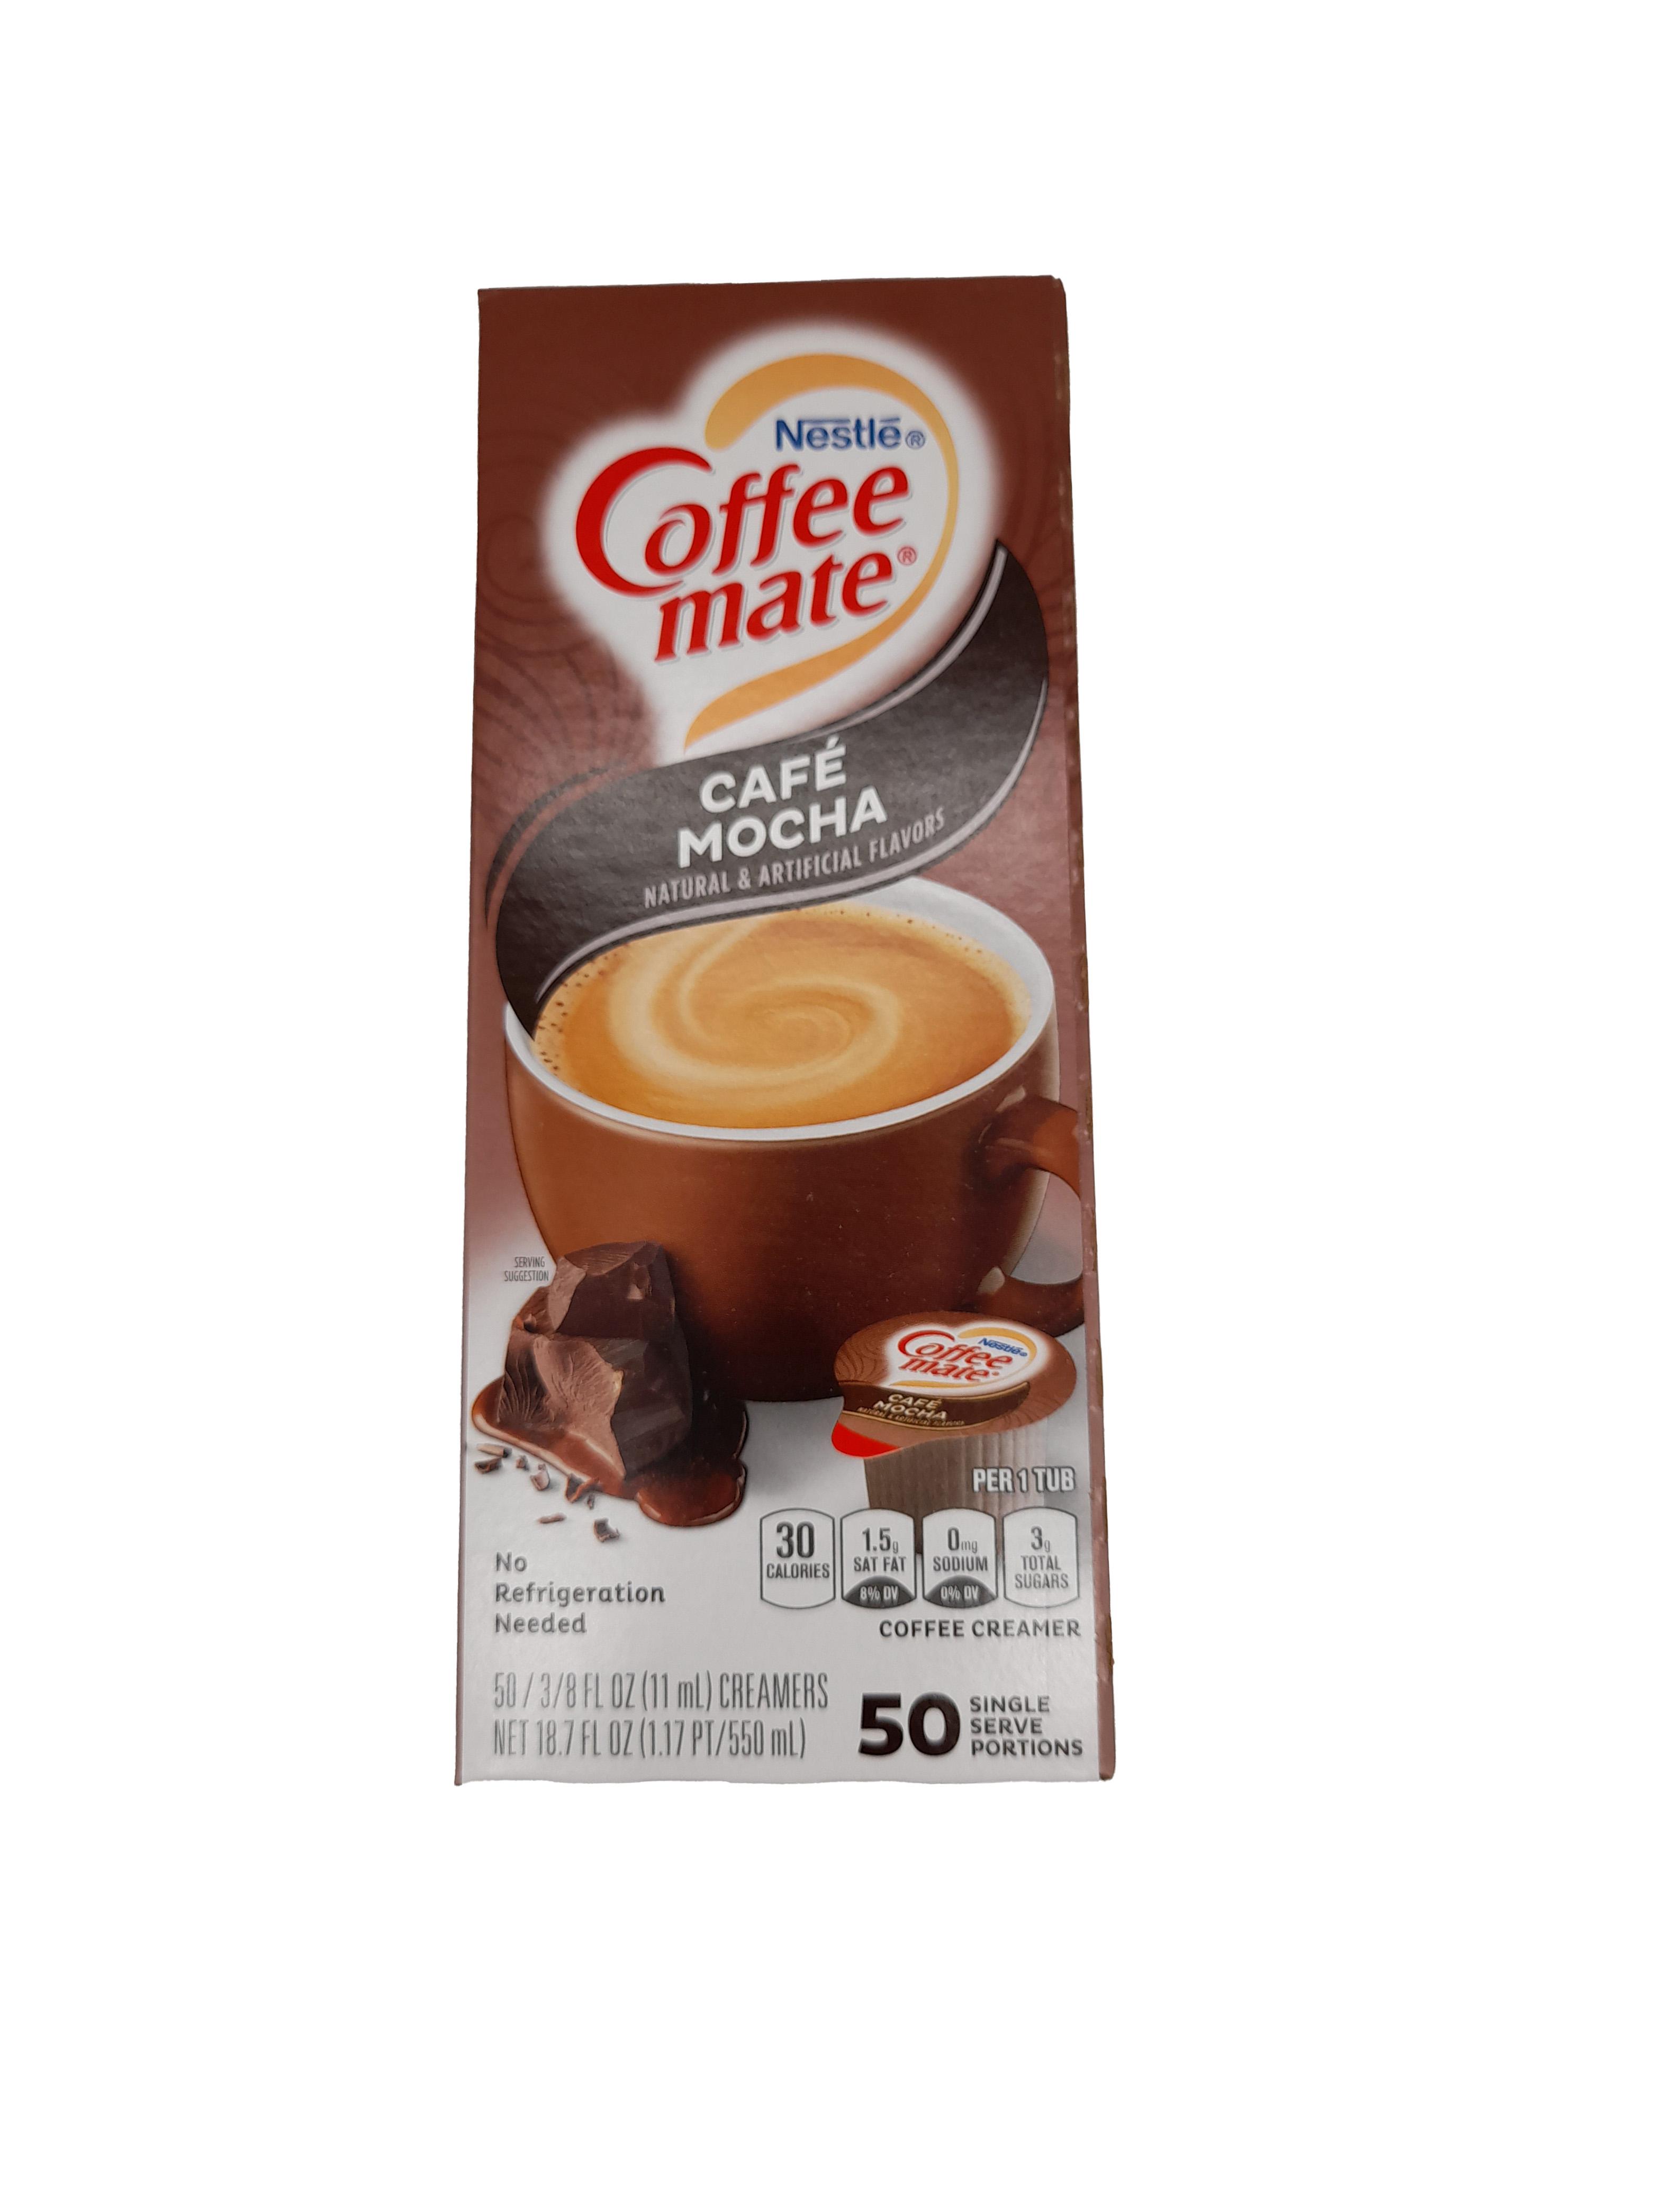 Nestle Coffee Mate Liquid Café Mocha Coffee Creamer 50x11ml (550ml)